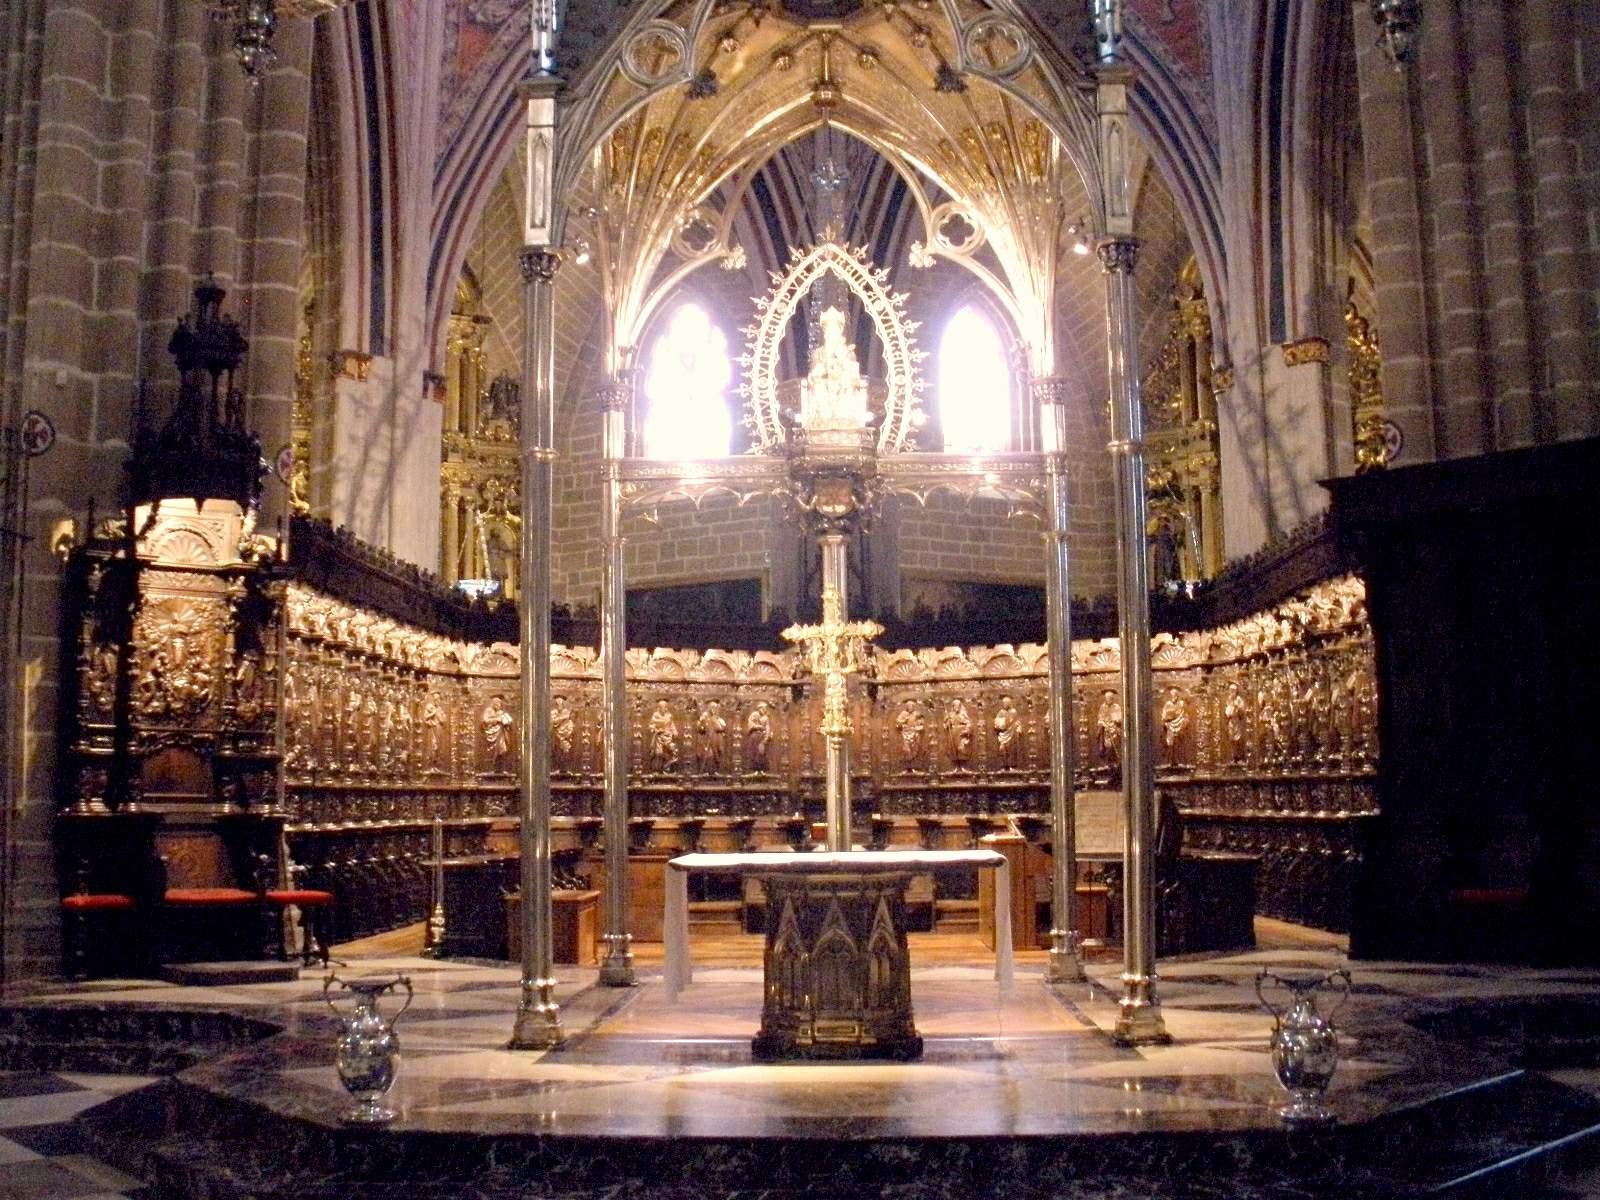 File:Pamplona - Catedral, interior 16.JPG - Wikimedia Commons